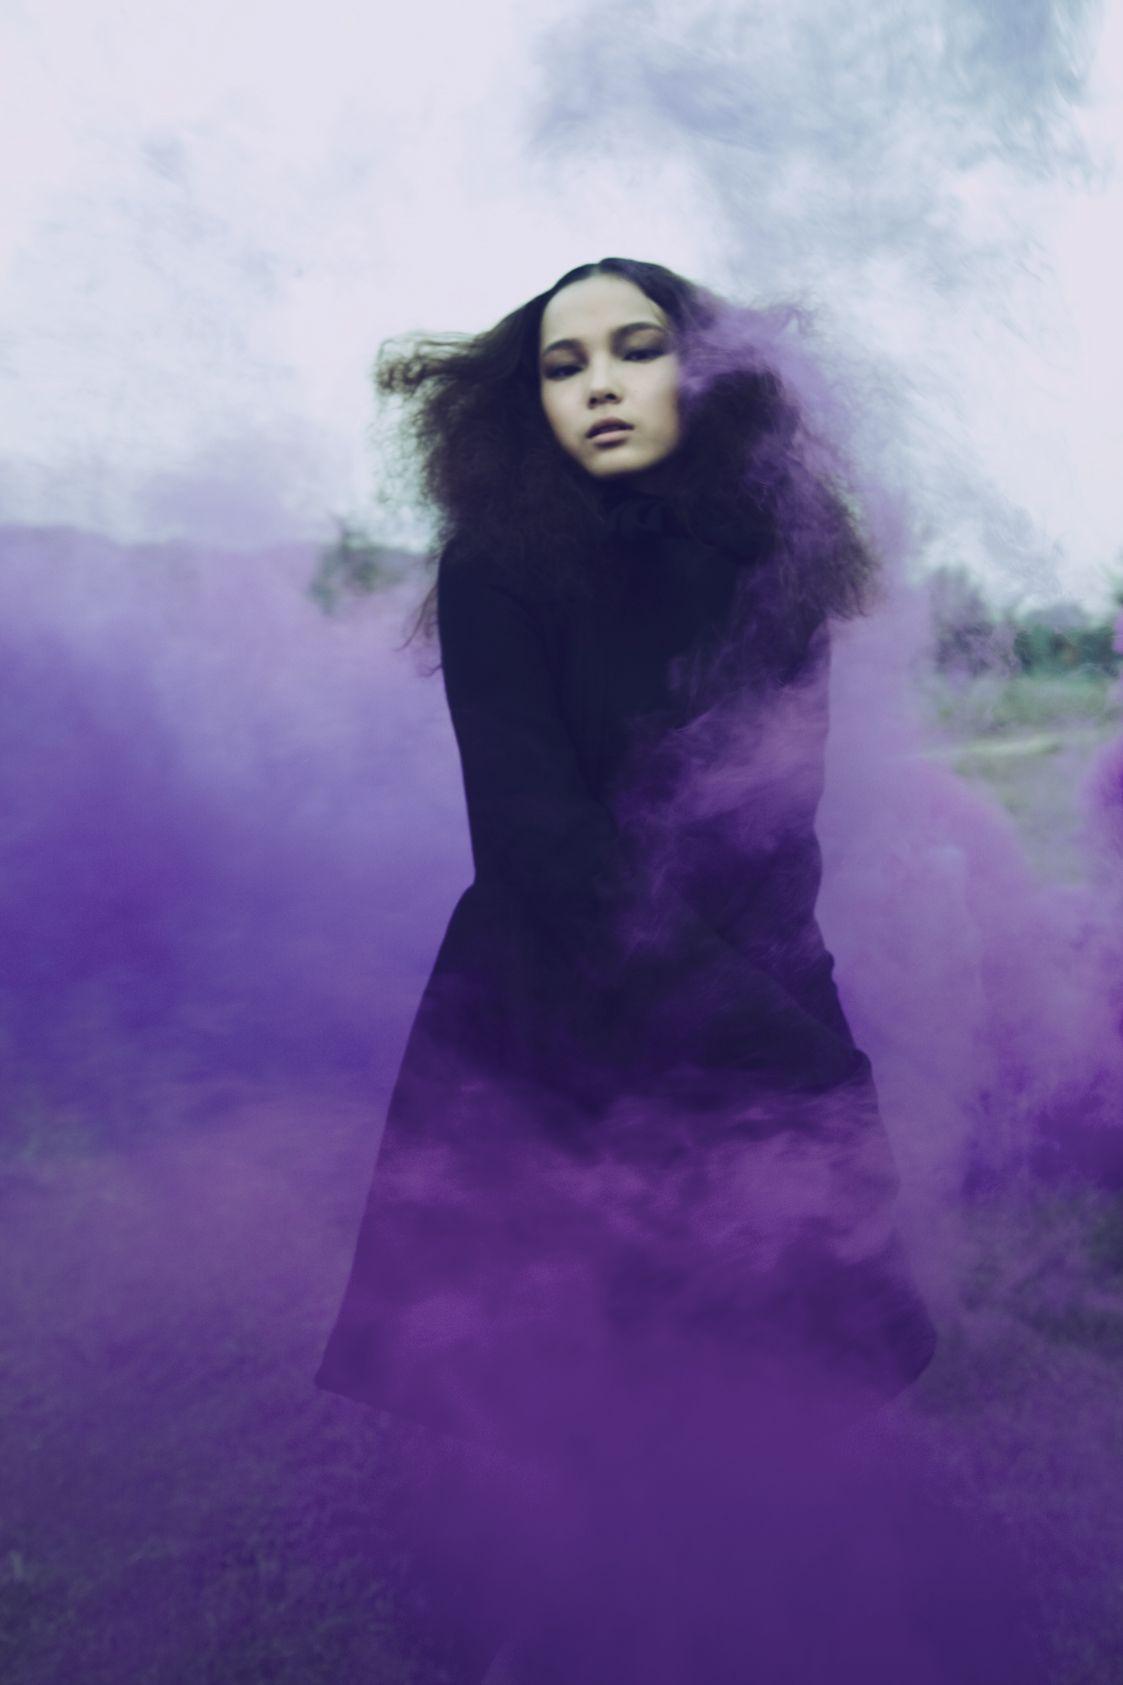 smoke bomb photography - Cerca con Google